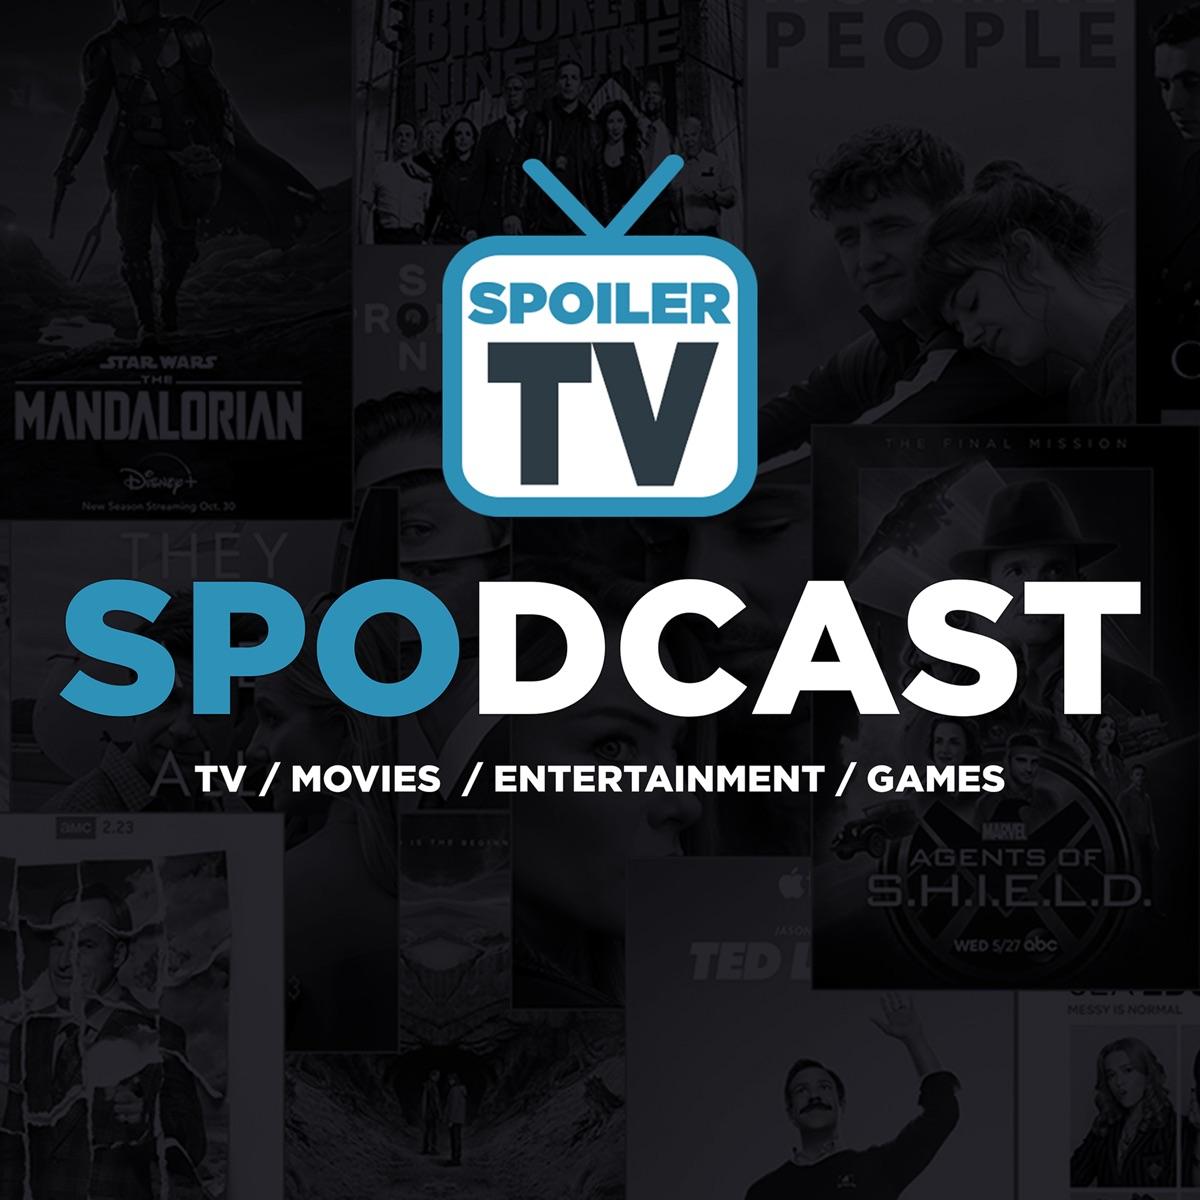 SPOILERTV Spodcast - TV, Movie, Entertainment and Game News